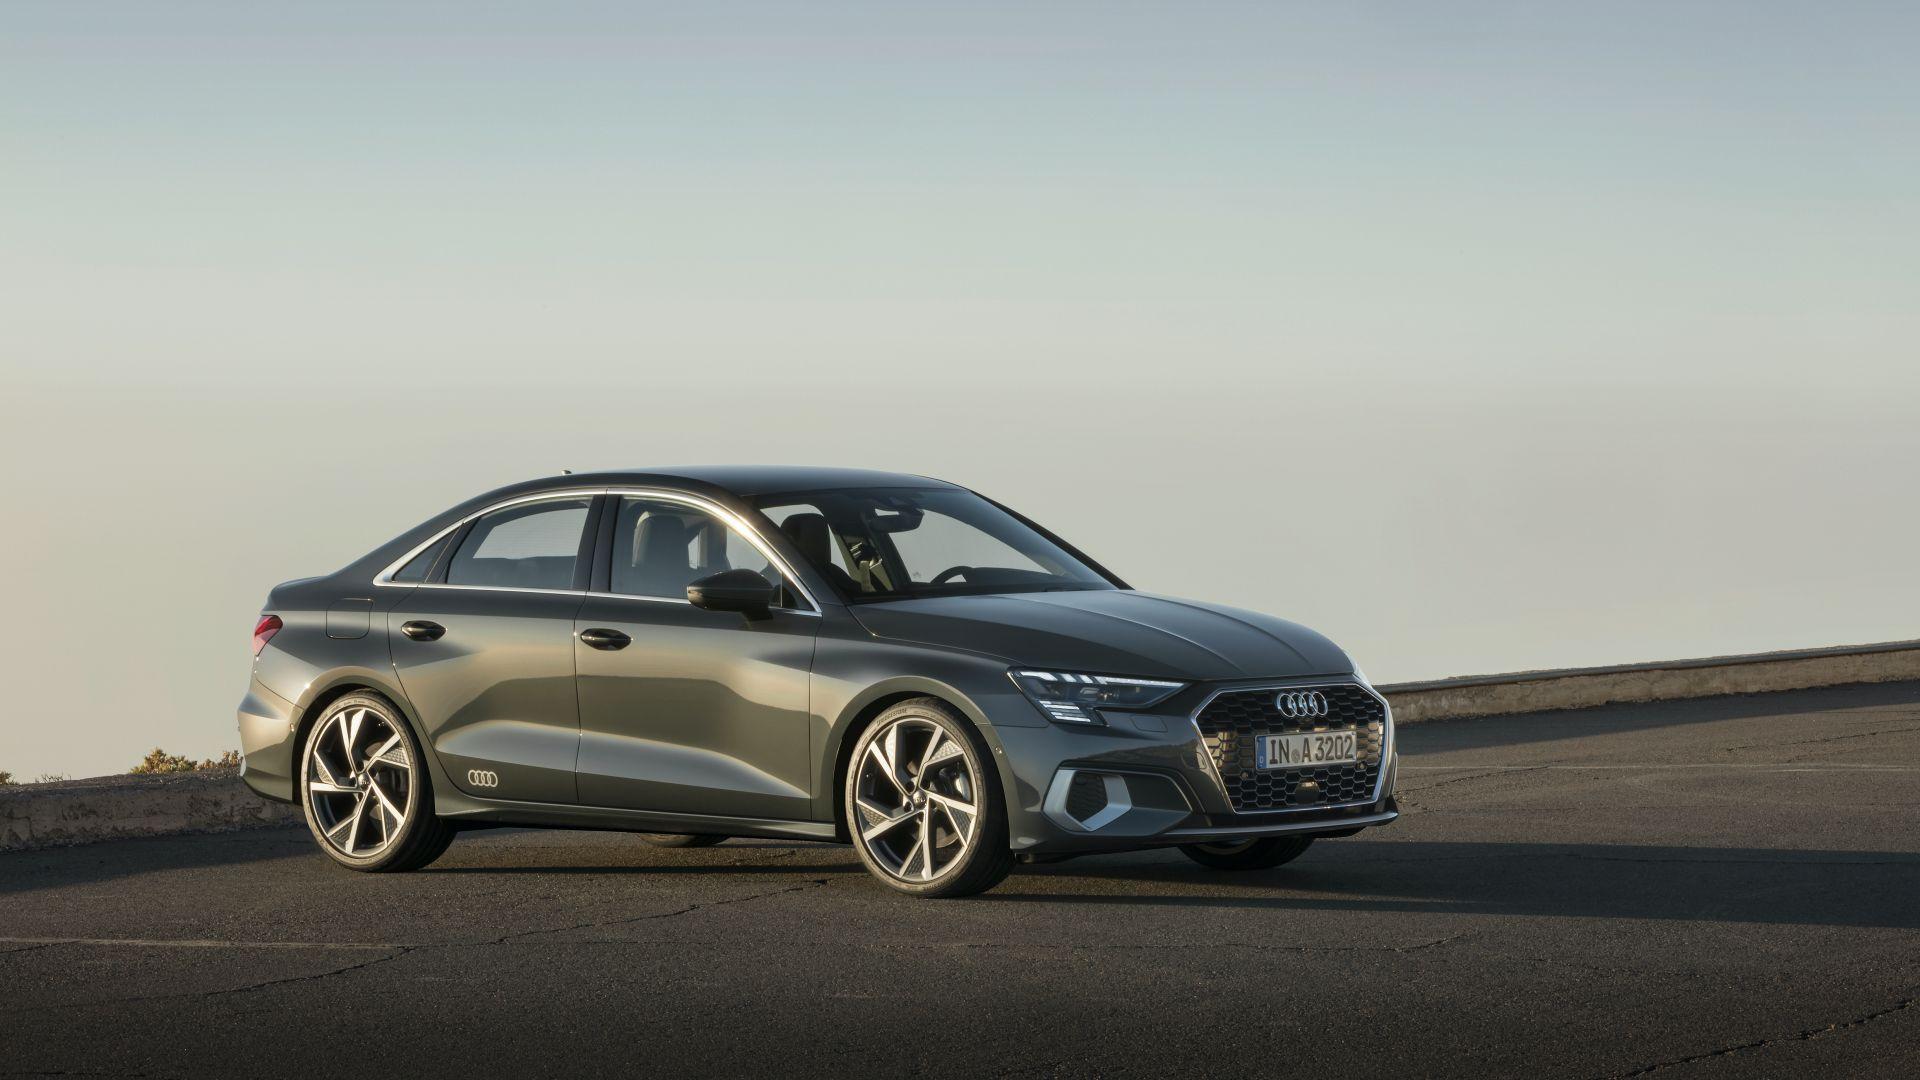 2021 Audi A3 Sedan Breaks Cover As The More Elegant A3 Family Member Carscoops